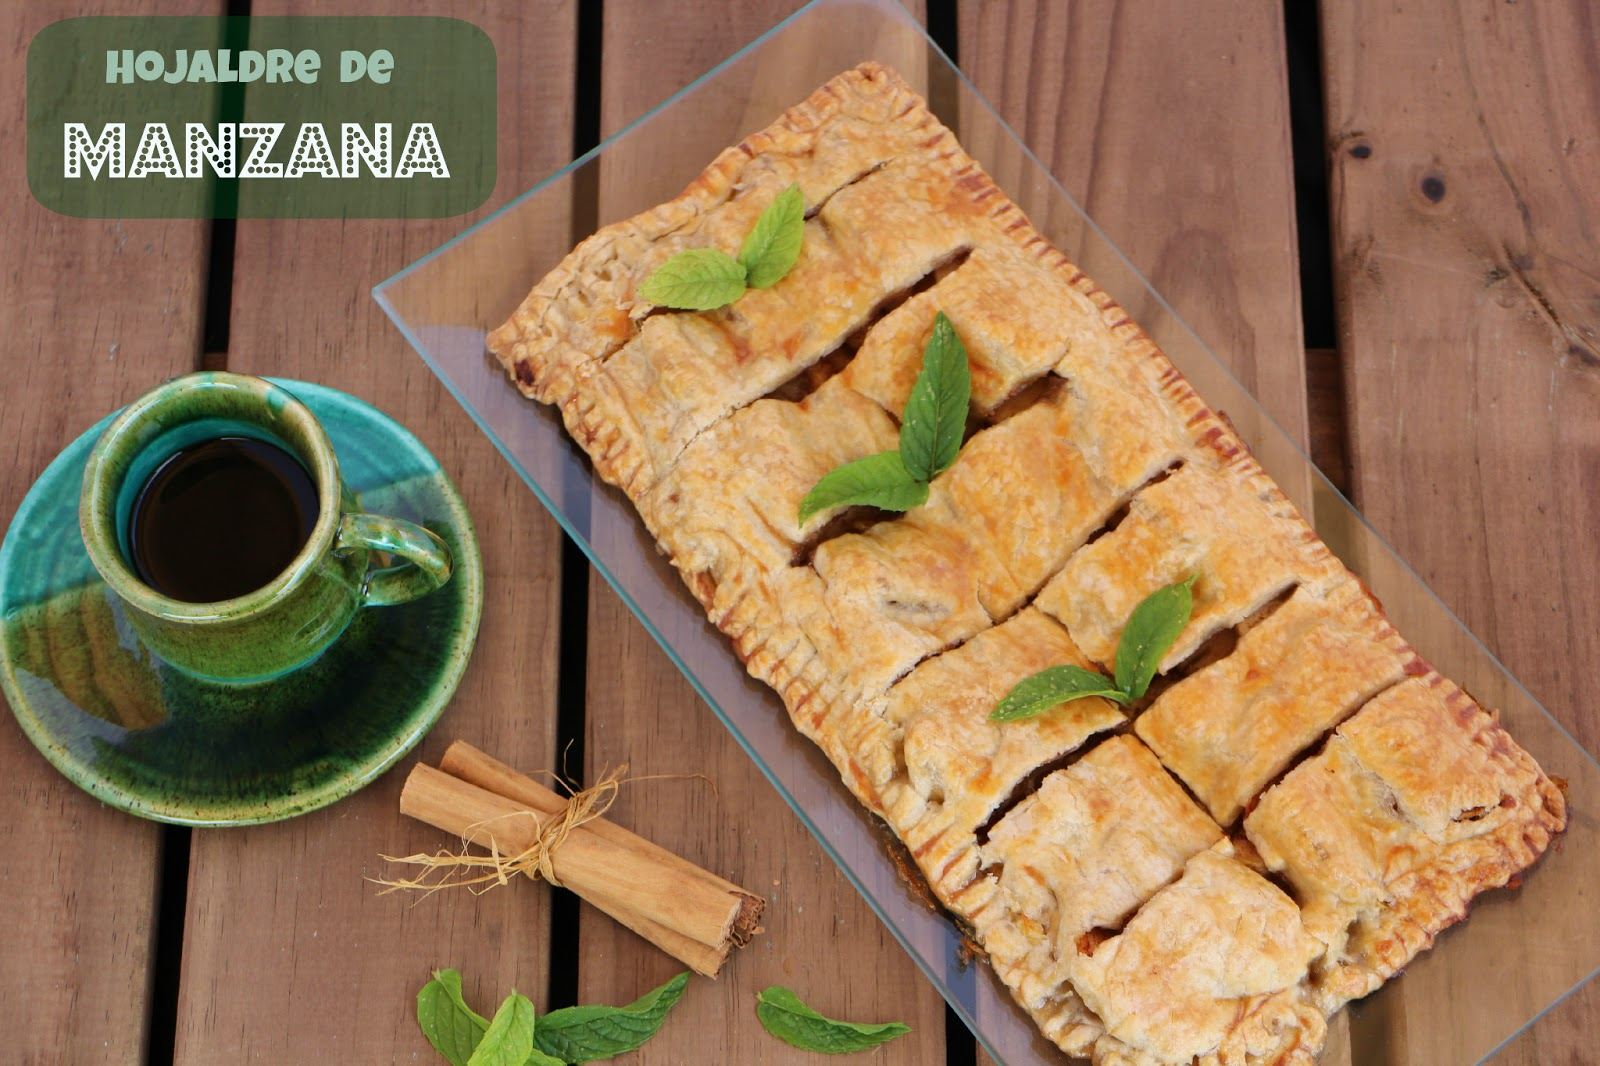 hojaldre-de-manzana, apple-puff-pastry